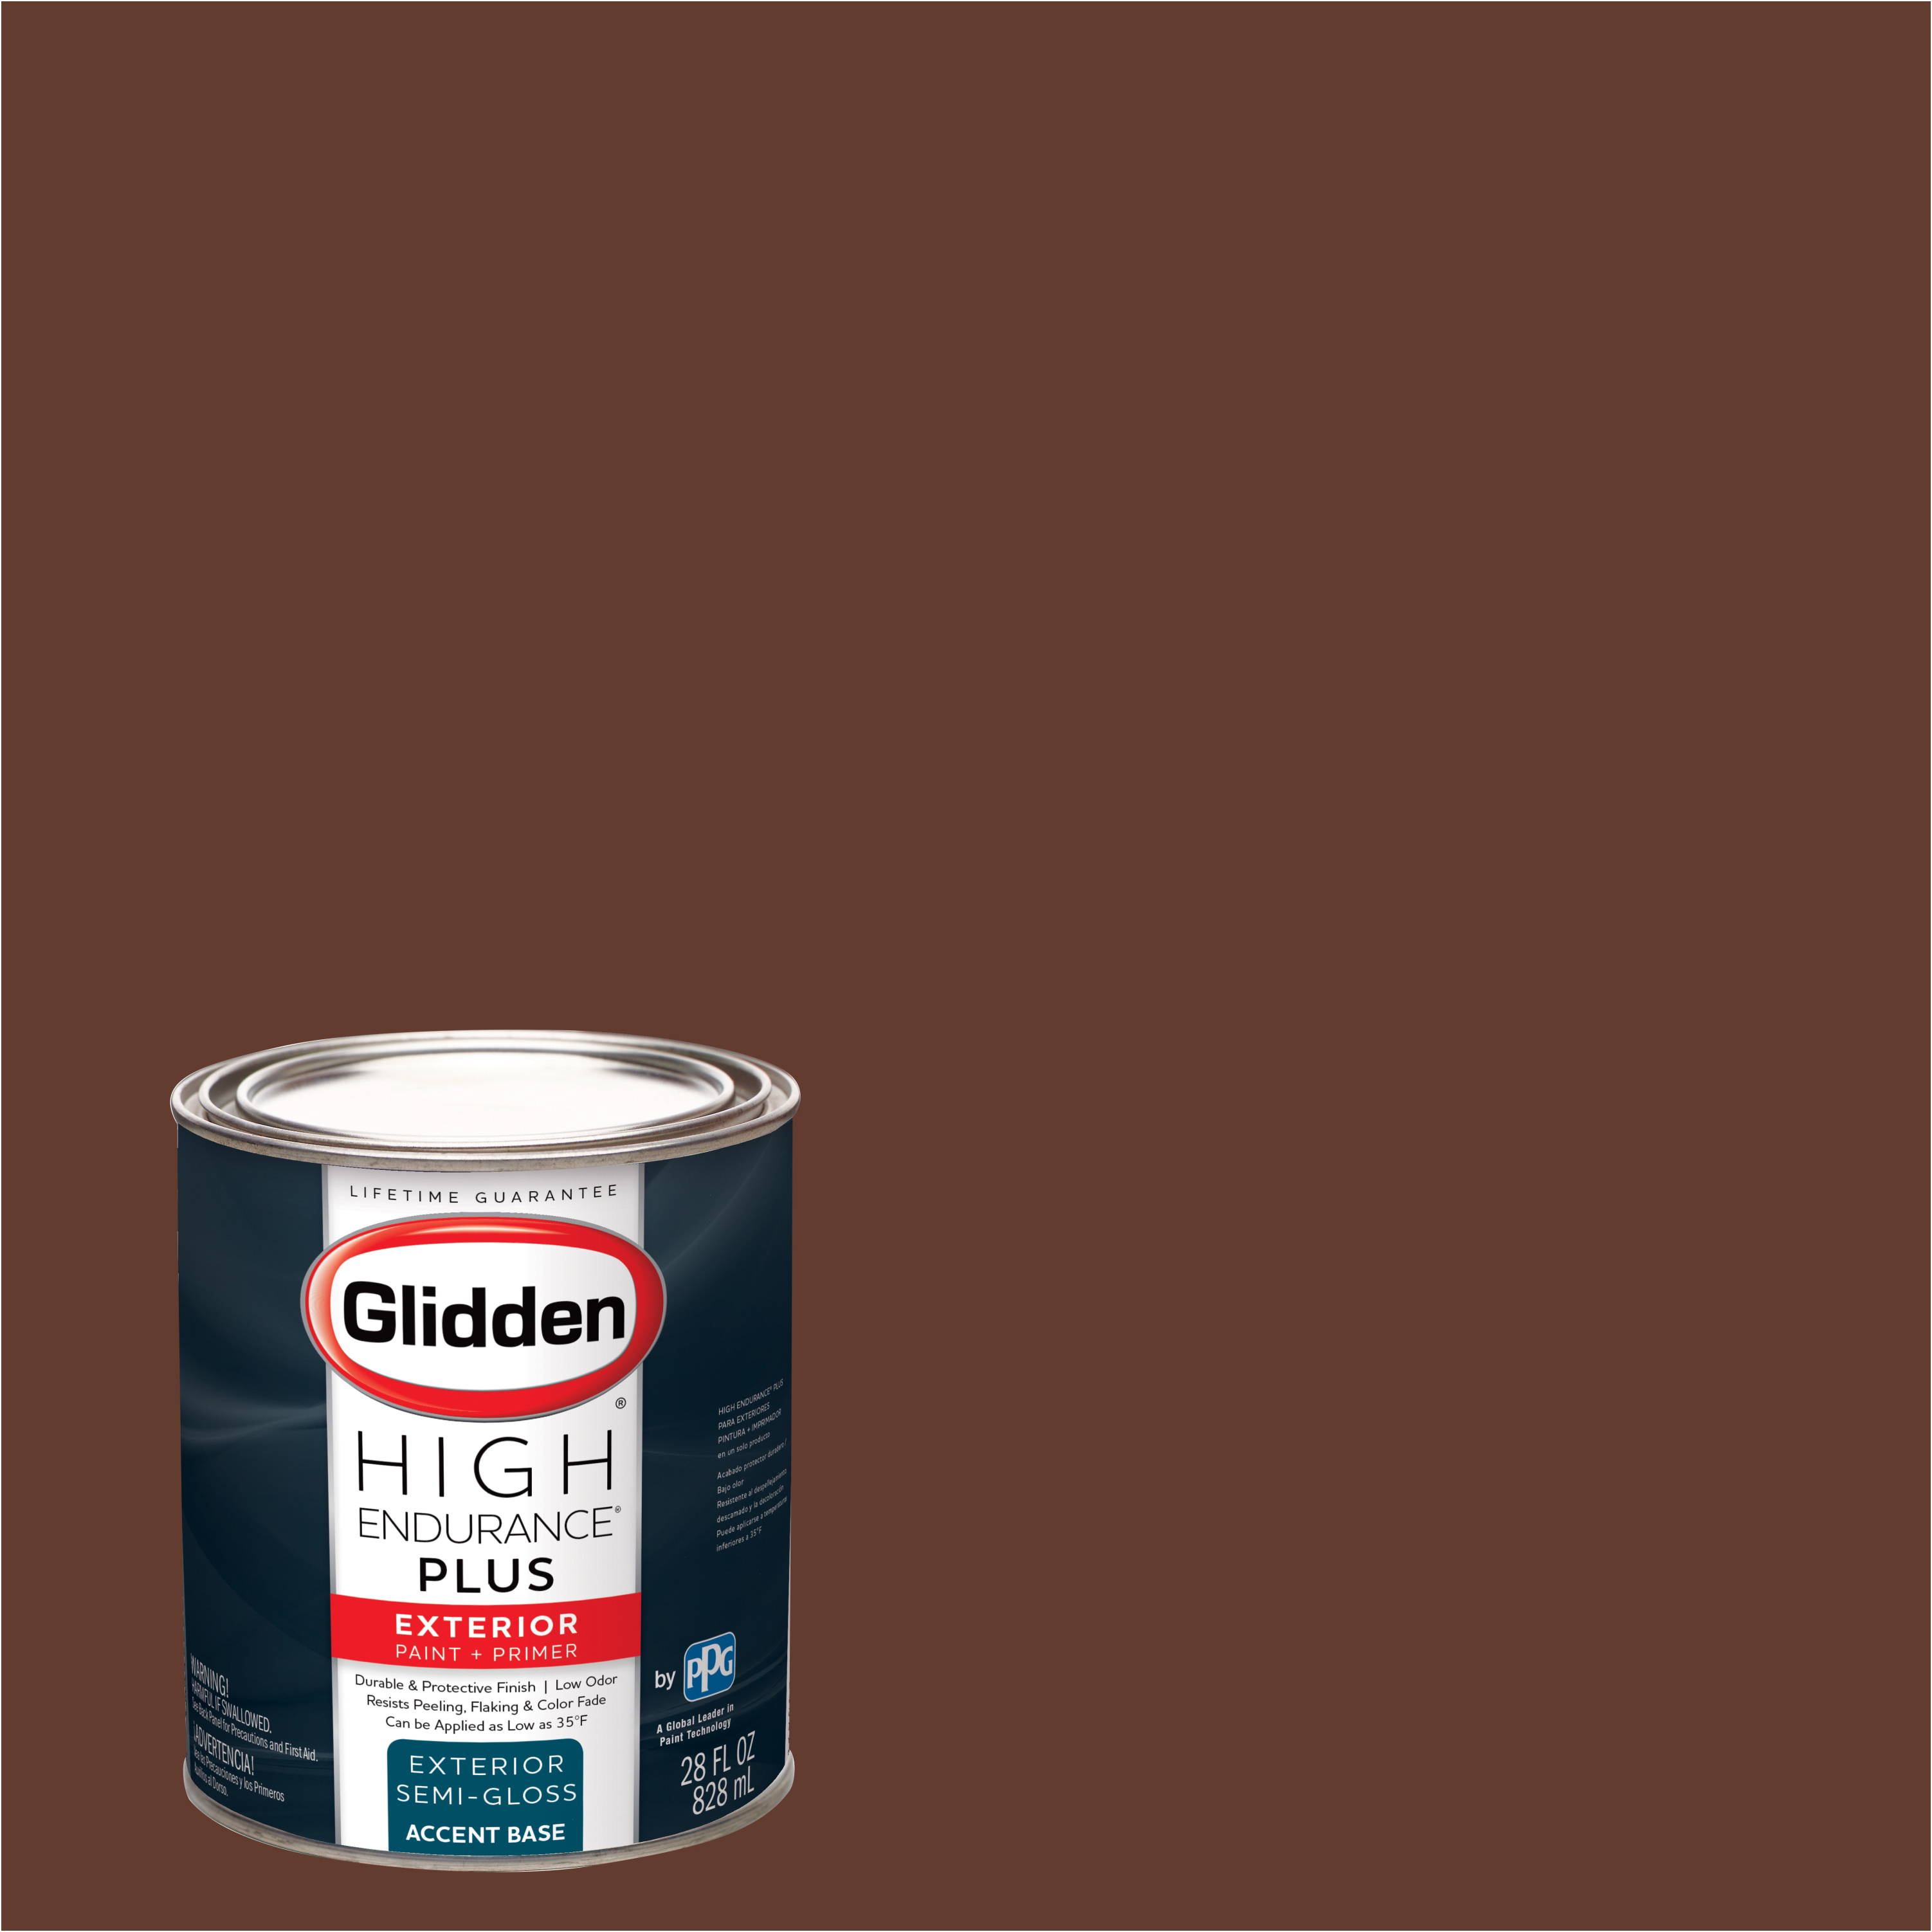 Glidden High Endurance Plus Exterior Paint and Primer, Old Redwood, #30YR 08/236